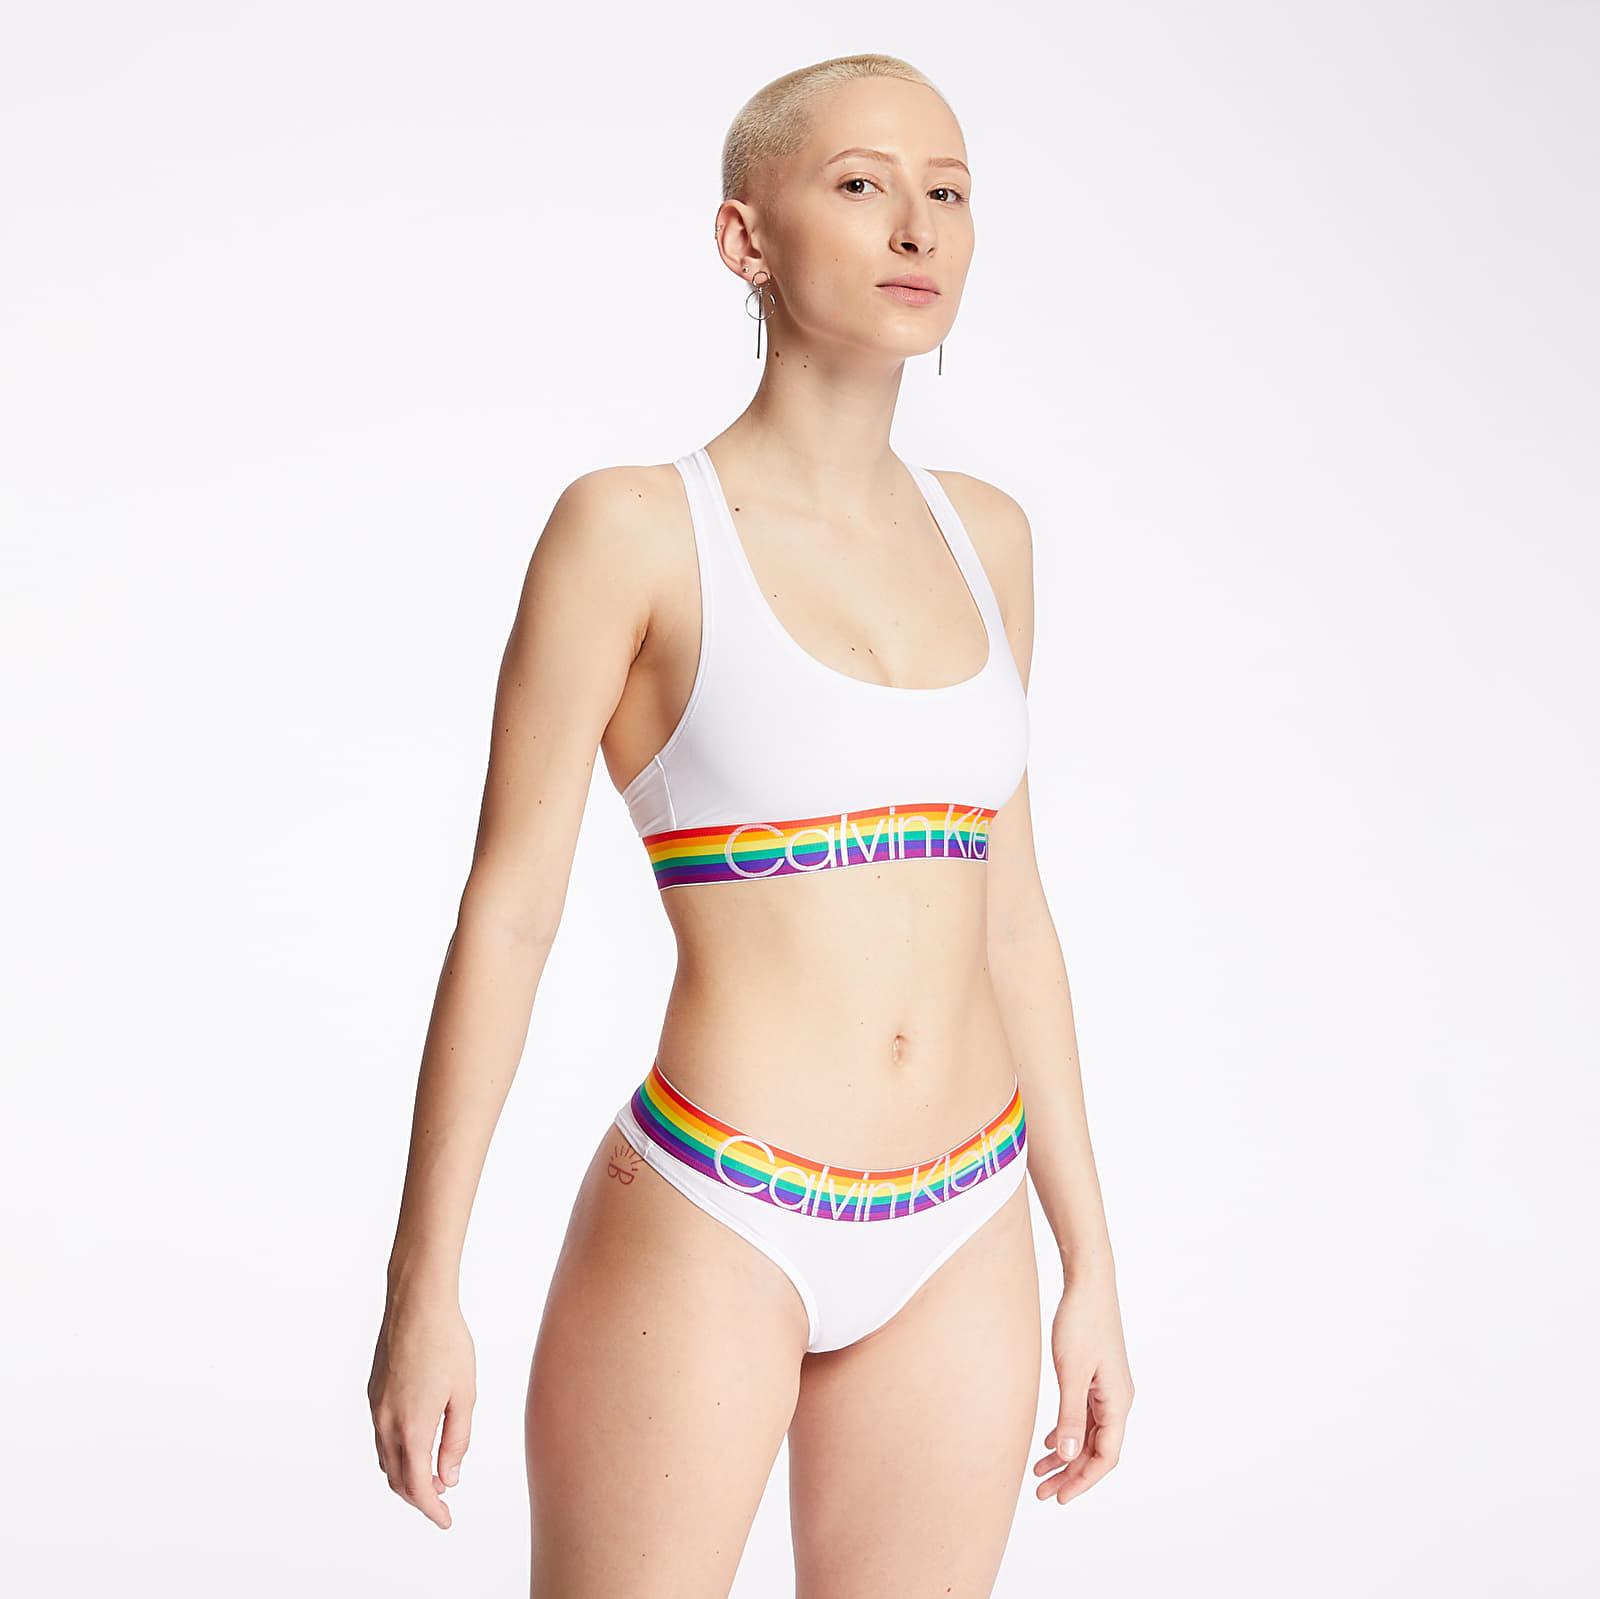 Dámské spodní prádlo Calvin Klein The Pride Edit Tanga White